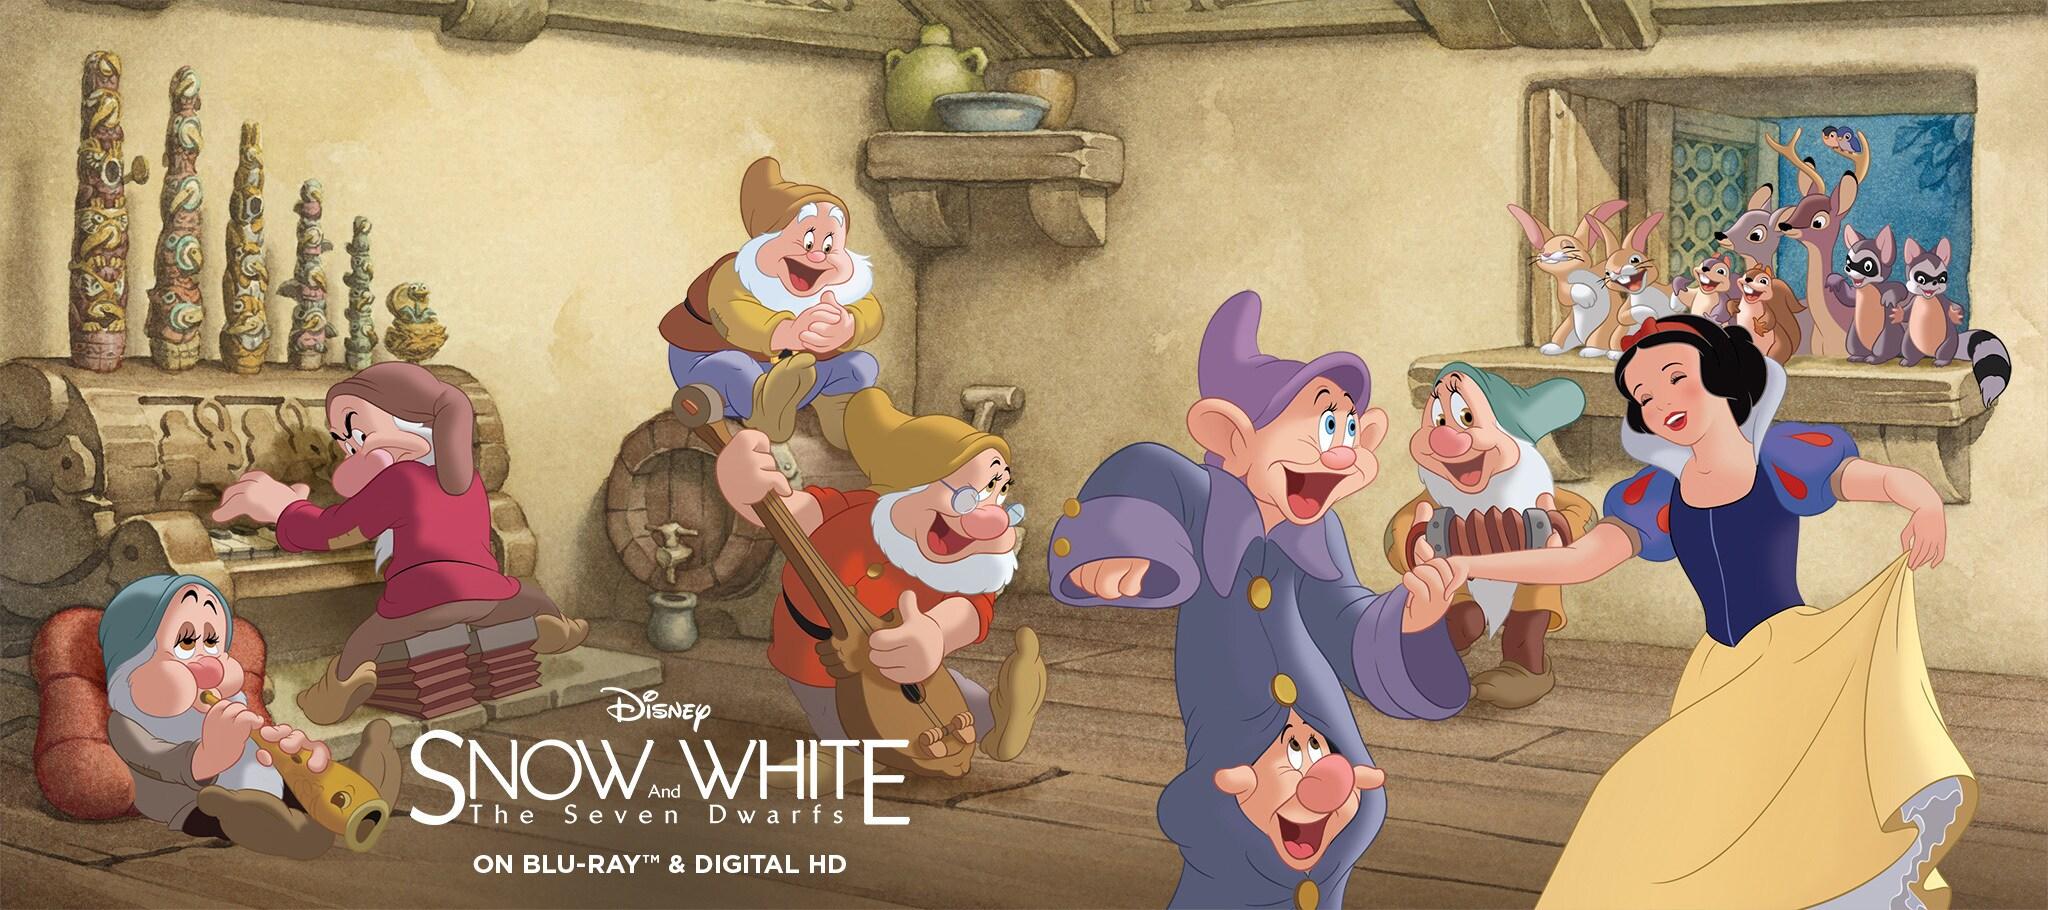 snow white and the seven dwarfs disney movies